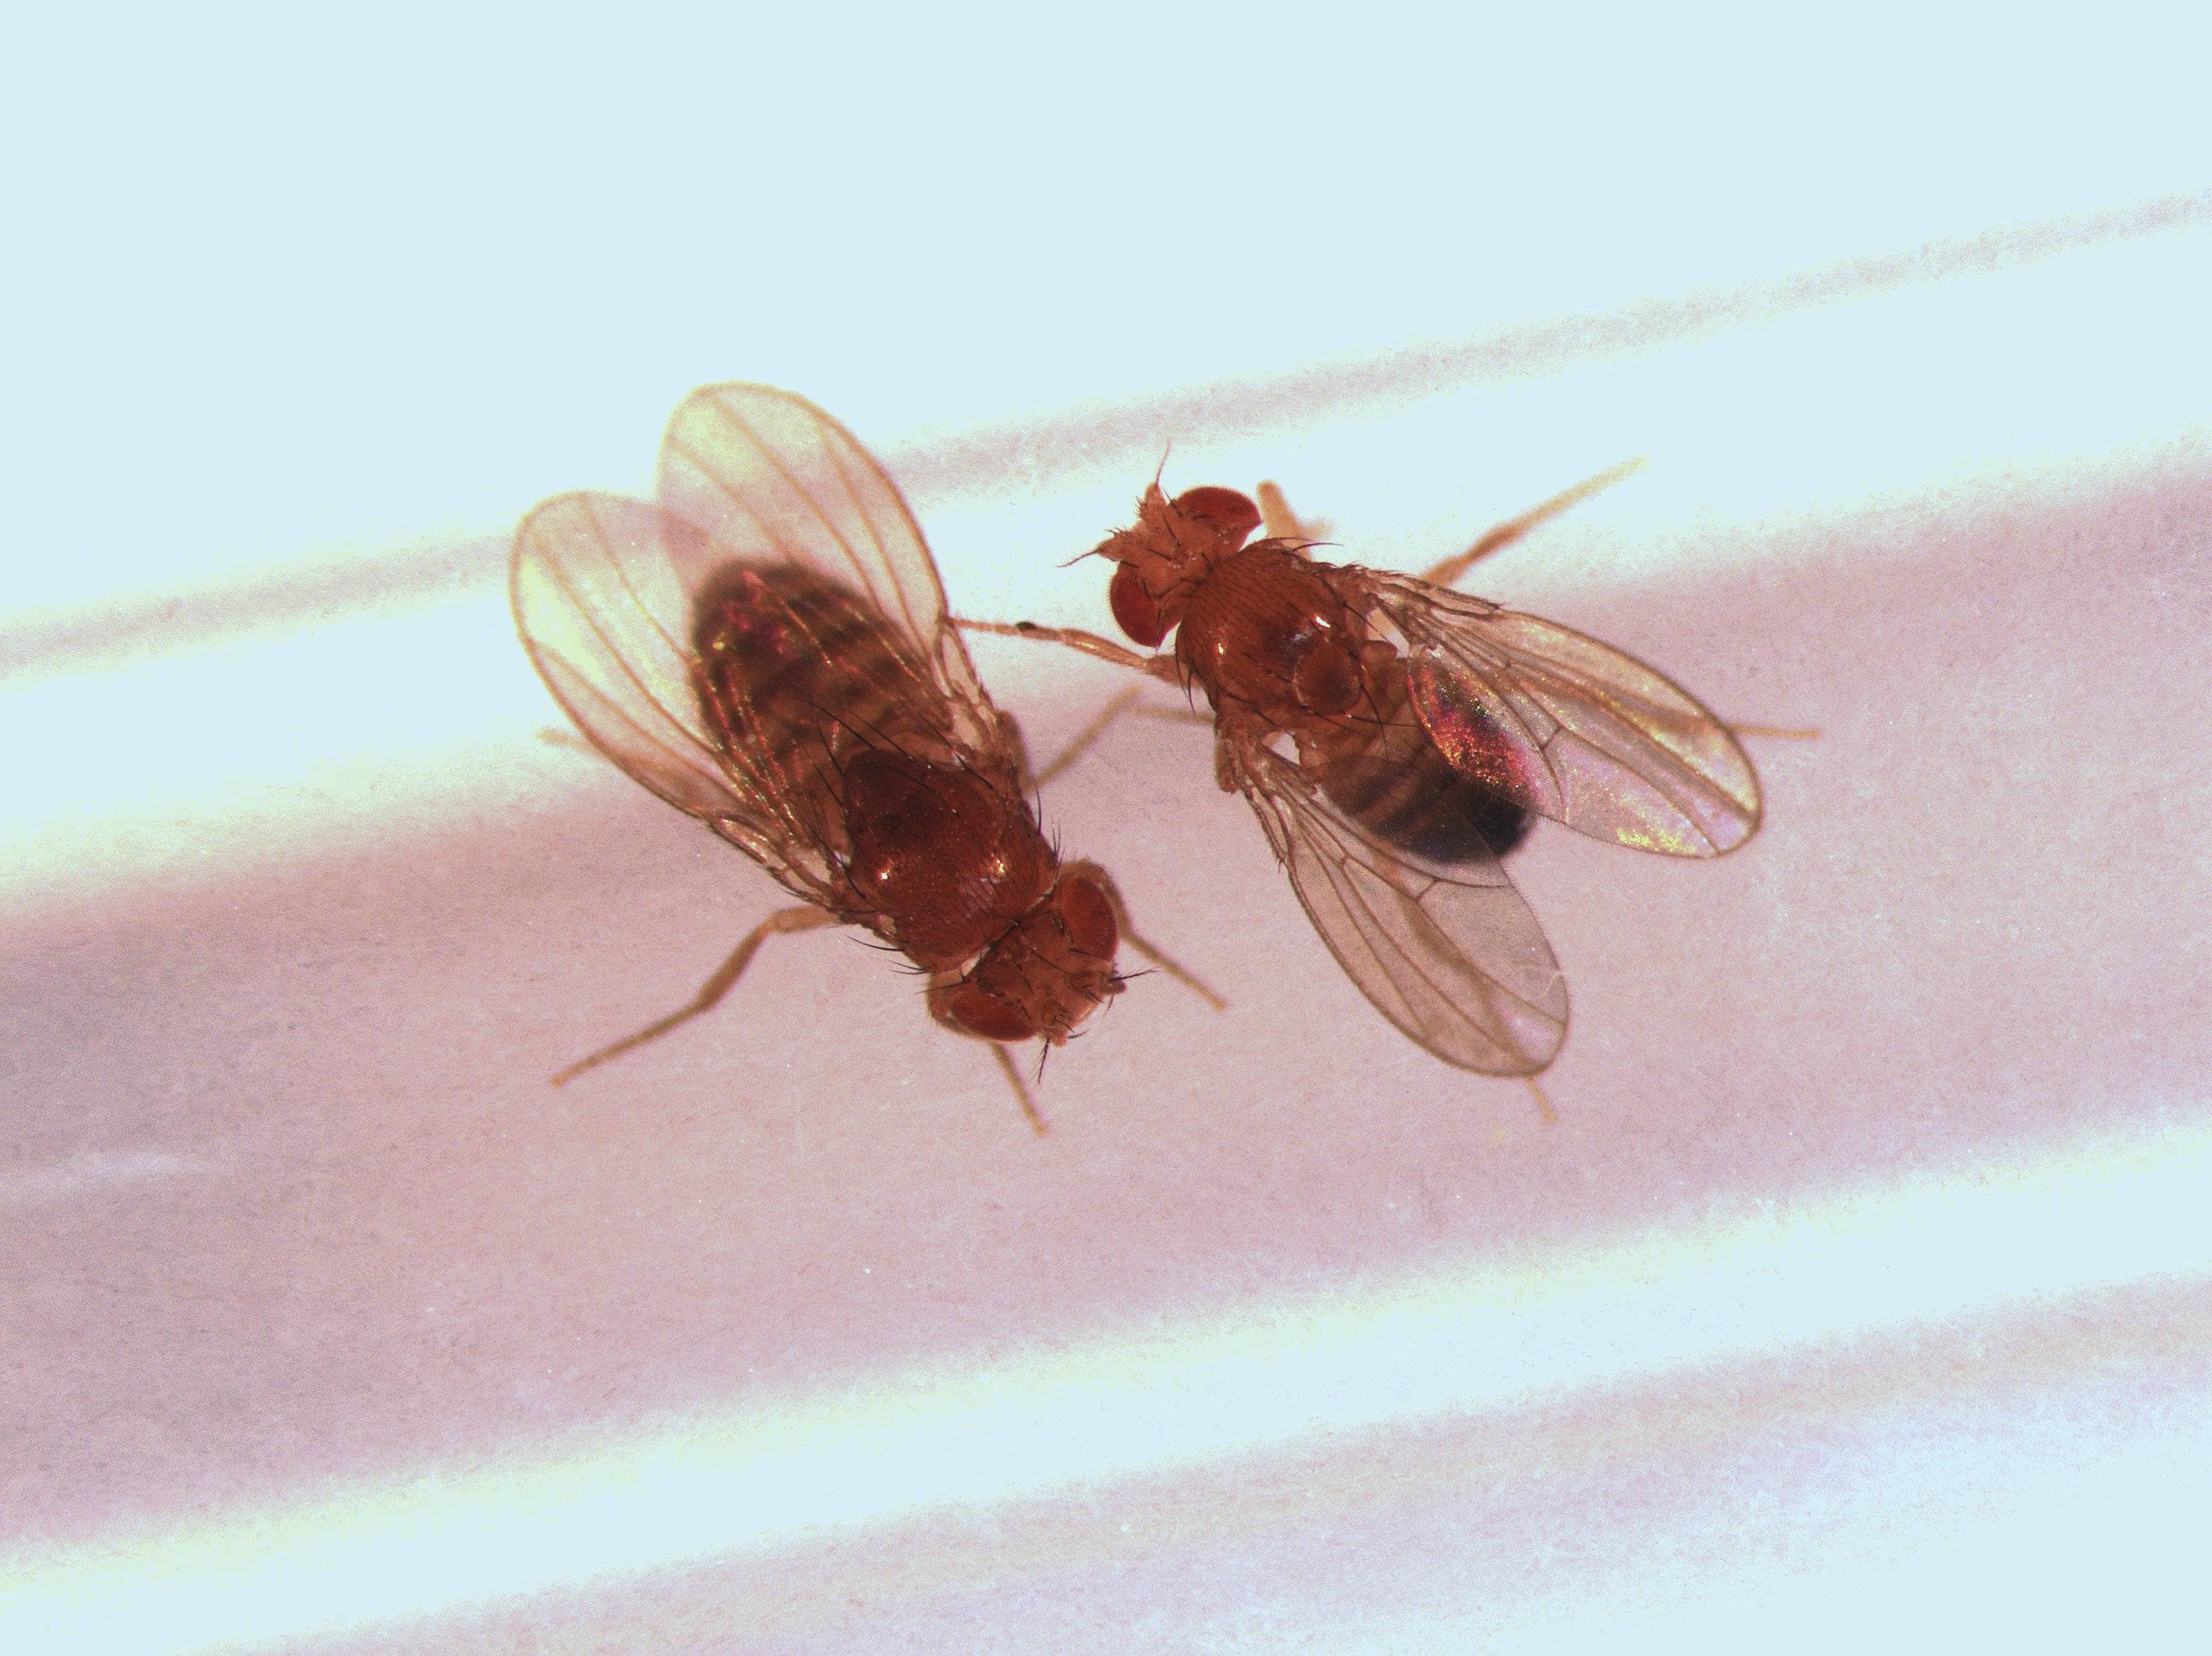 Droboučké octomilky (Drosophila pseudoobscura)